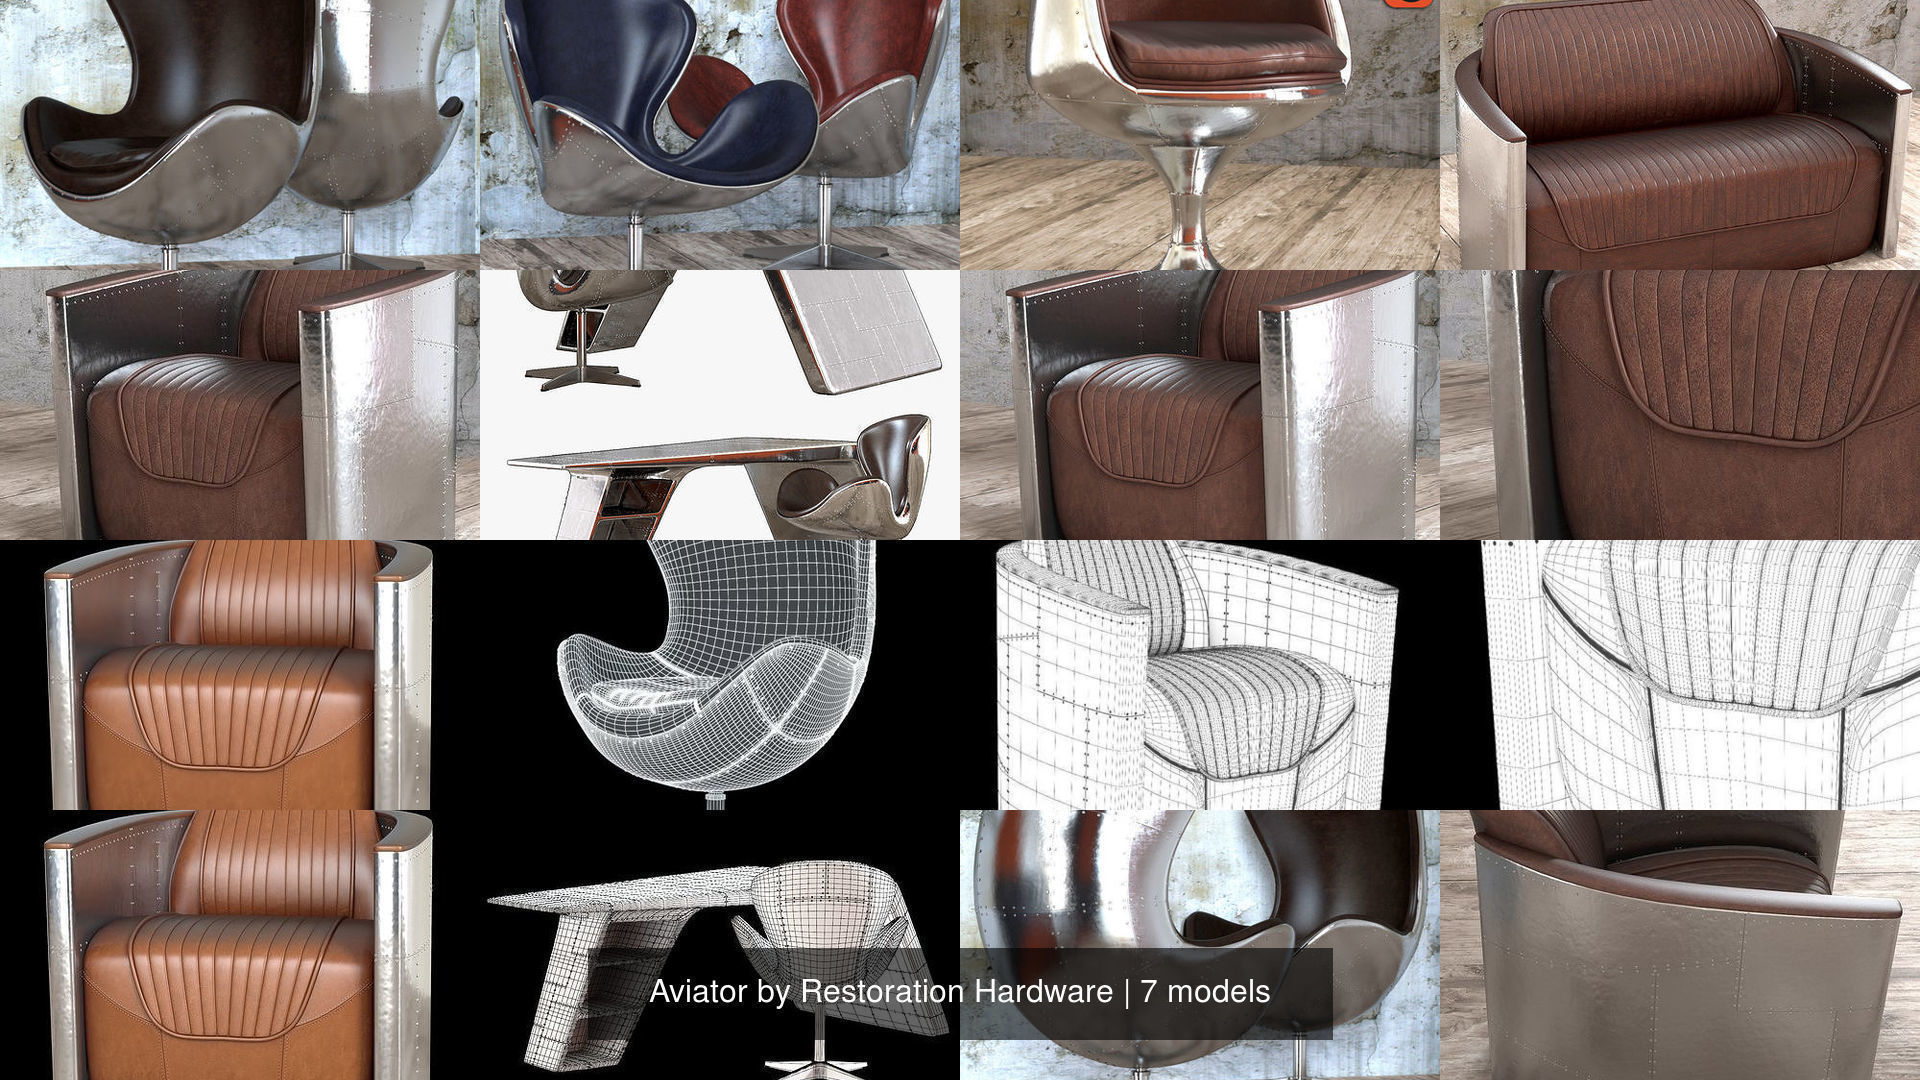 Admirable Aviator By Restoration Hardware 3D Model Collection Short Links Chair Design For Home Short Linksinfo